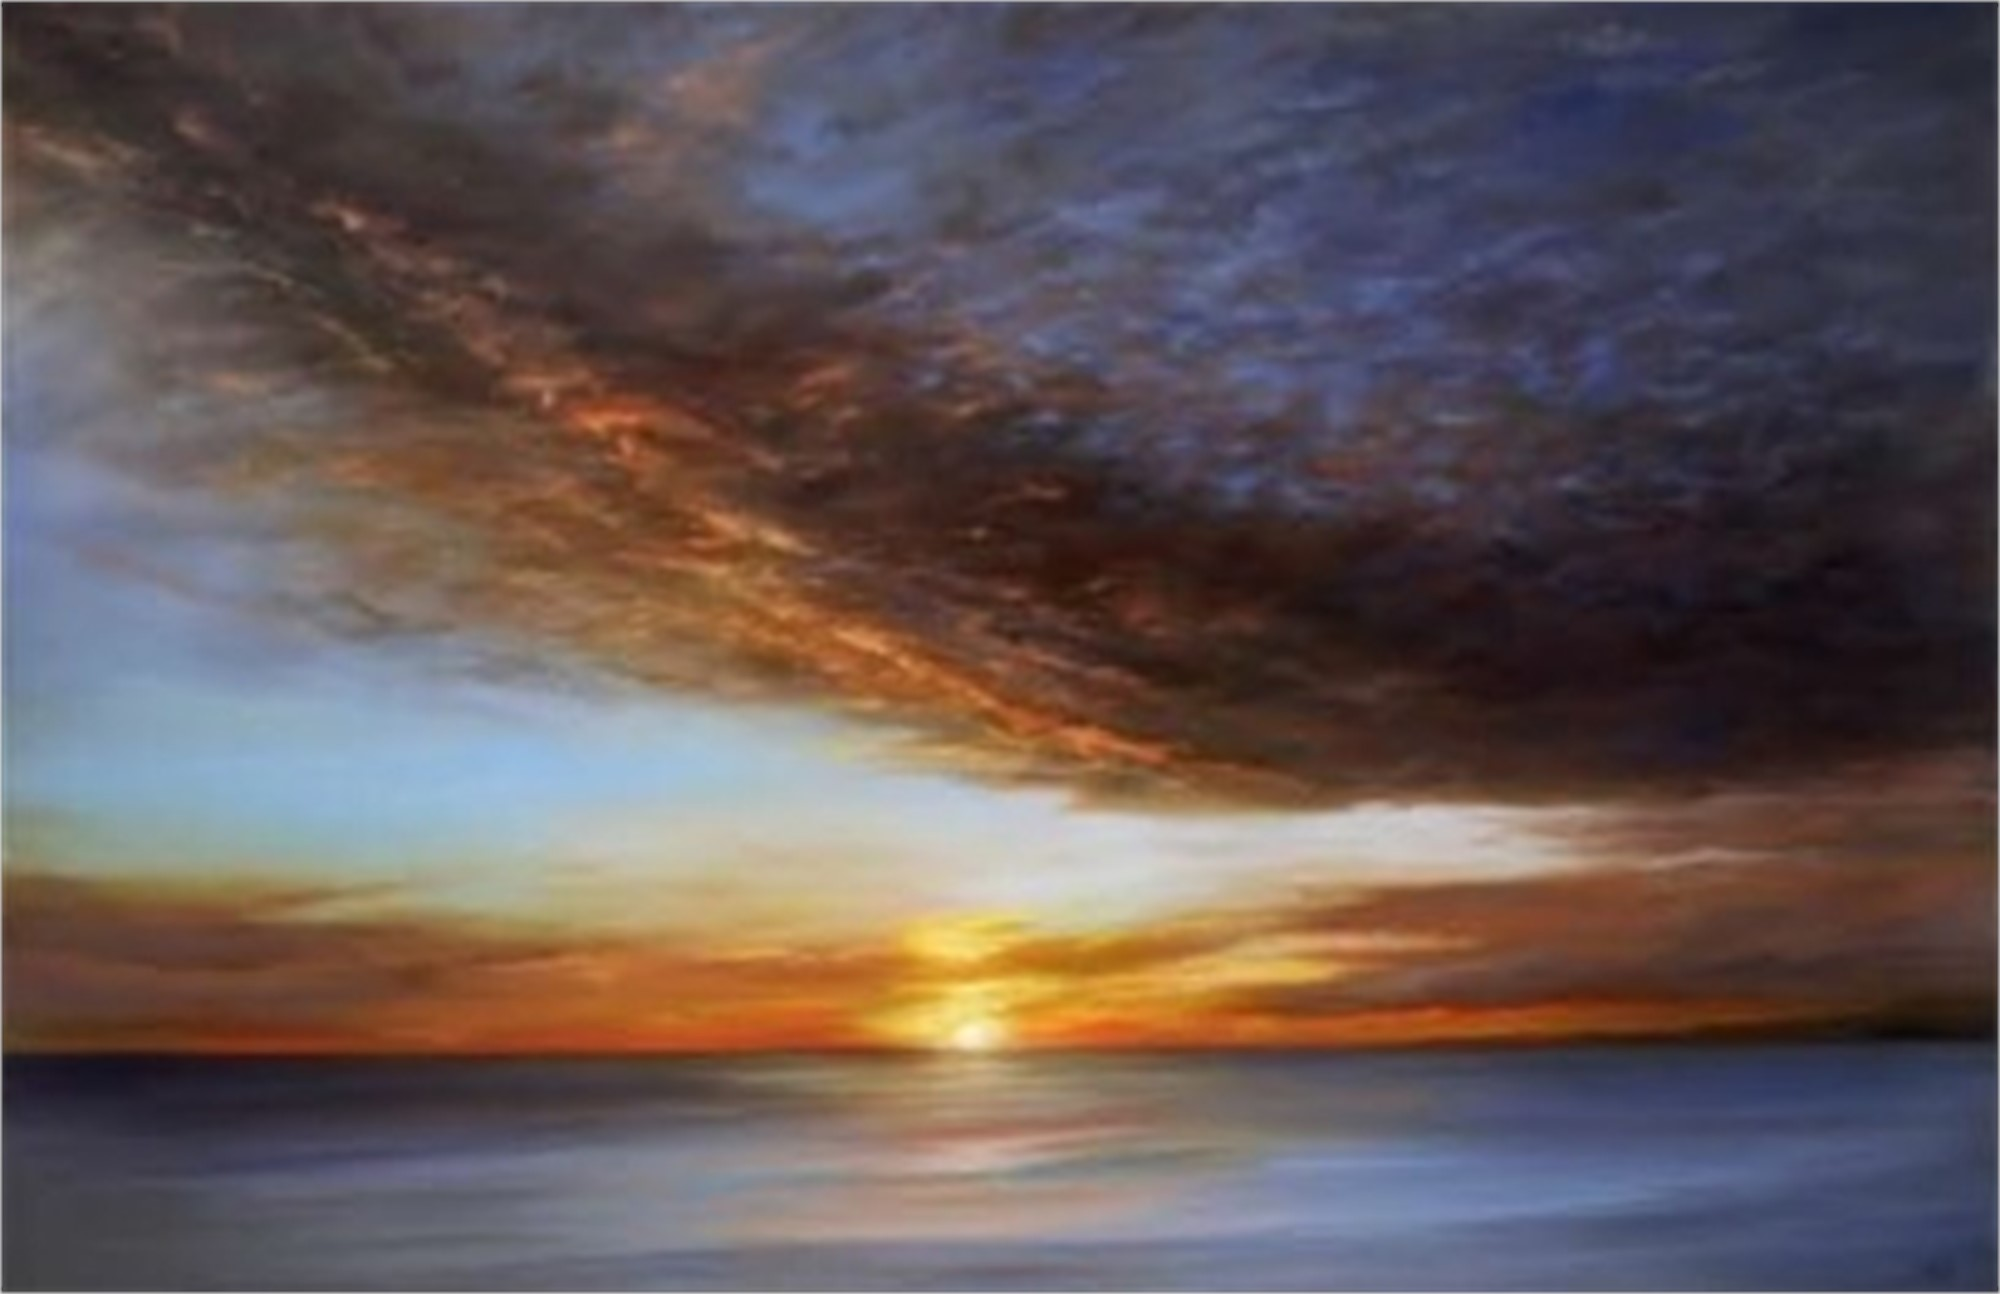 Cannon of the Sky (SN) by Cheryl Kline